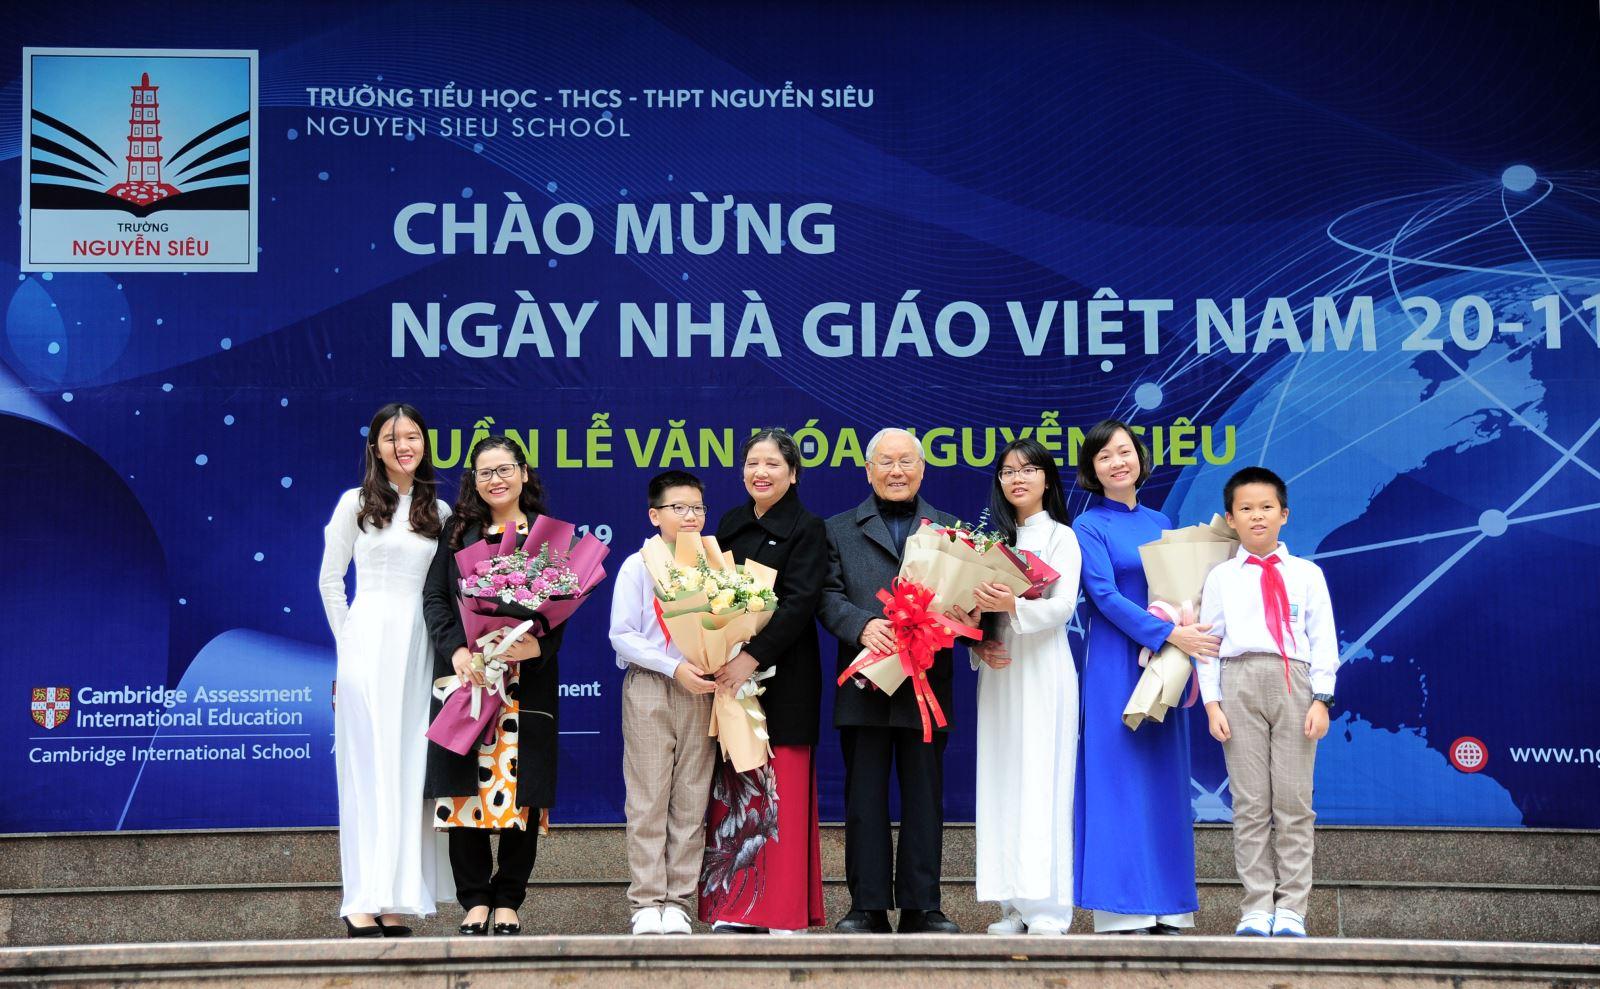 Celebrating Vietnamese teacher day with Nguyen Sieu